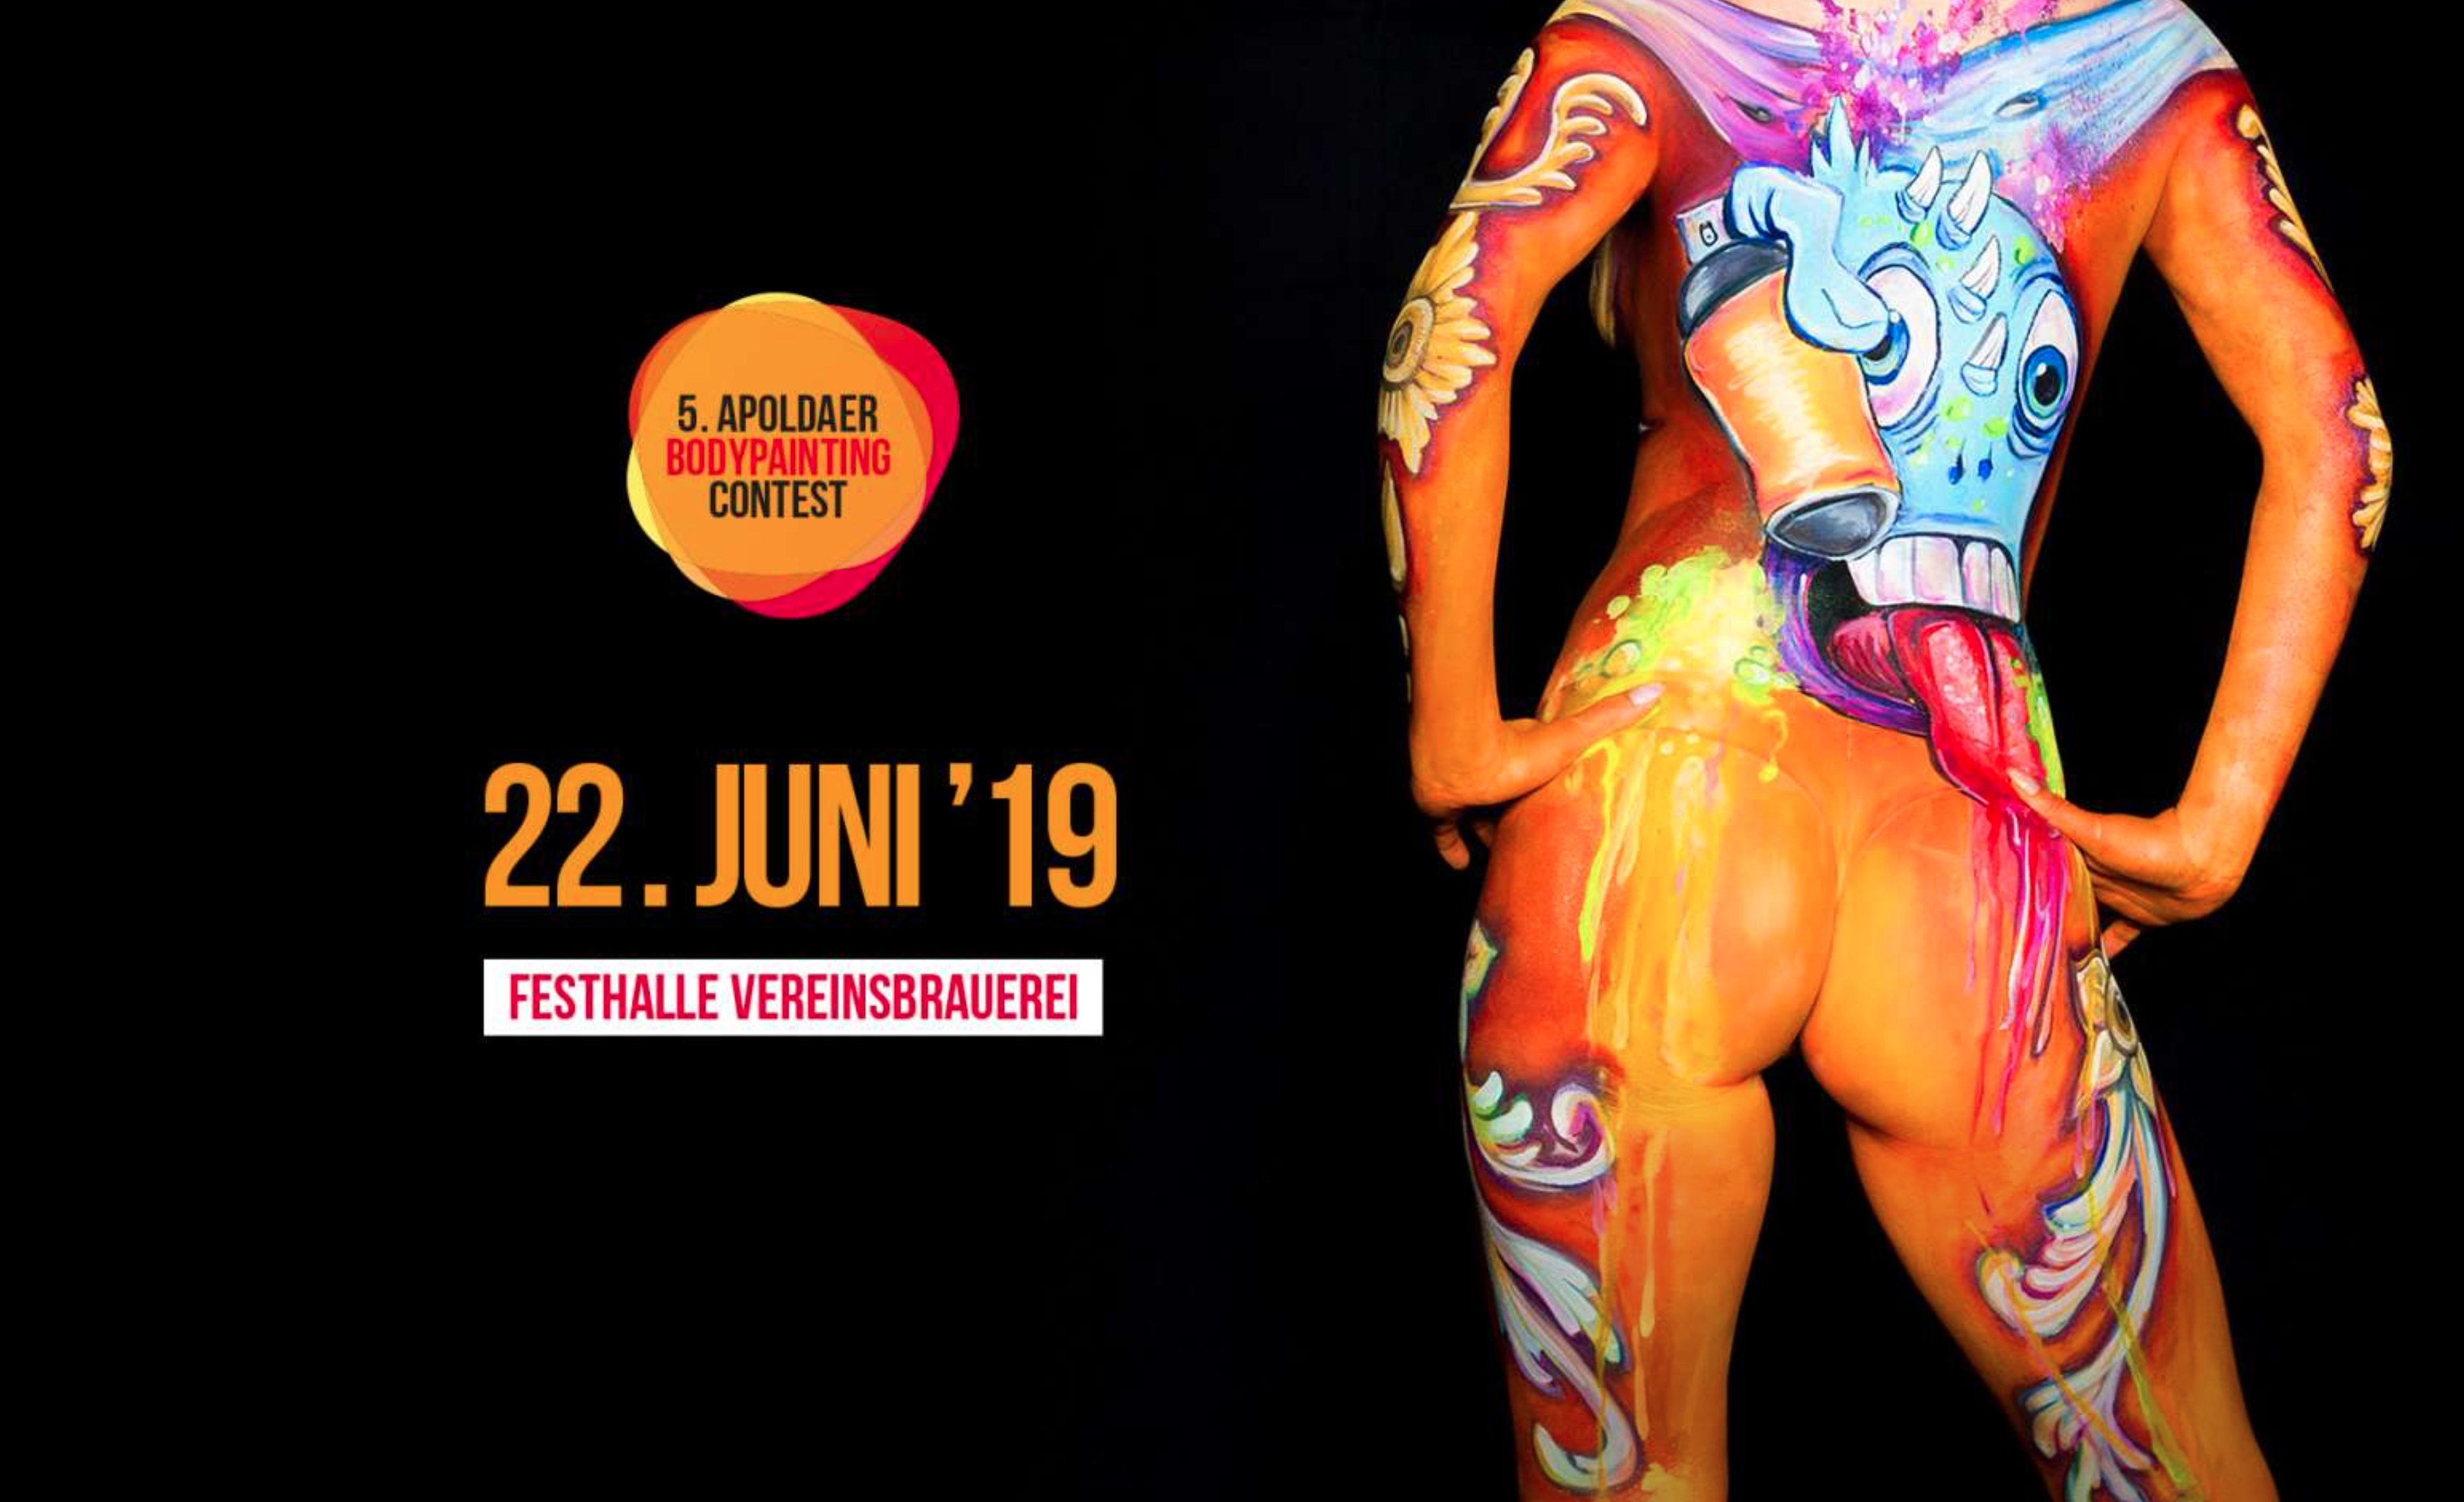 Apoldaer Bodypainting Contest 2019